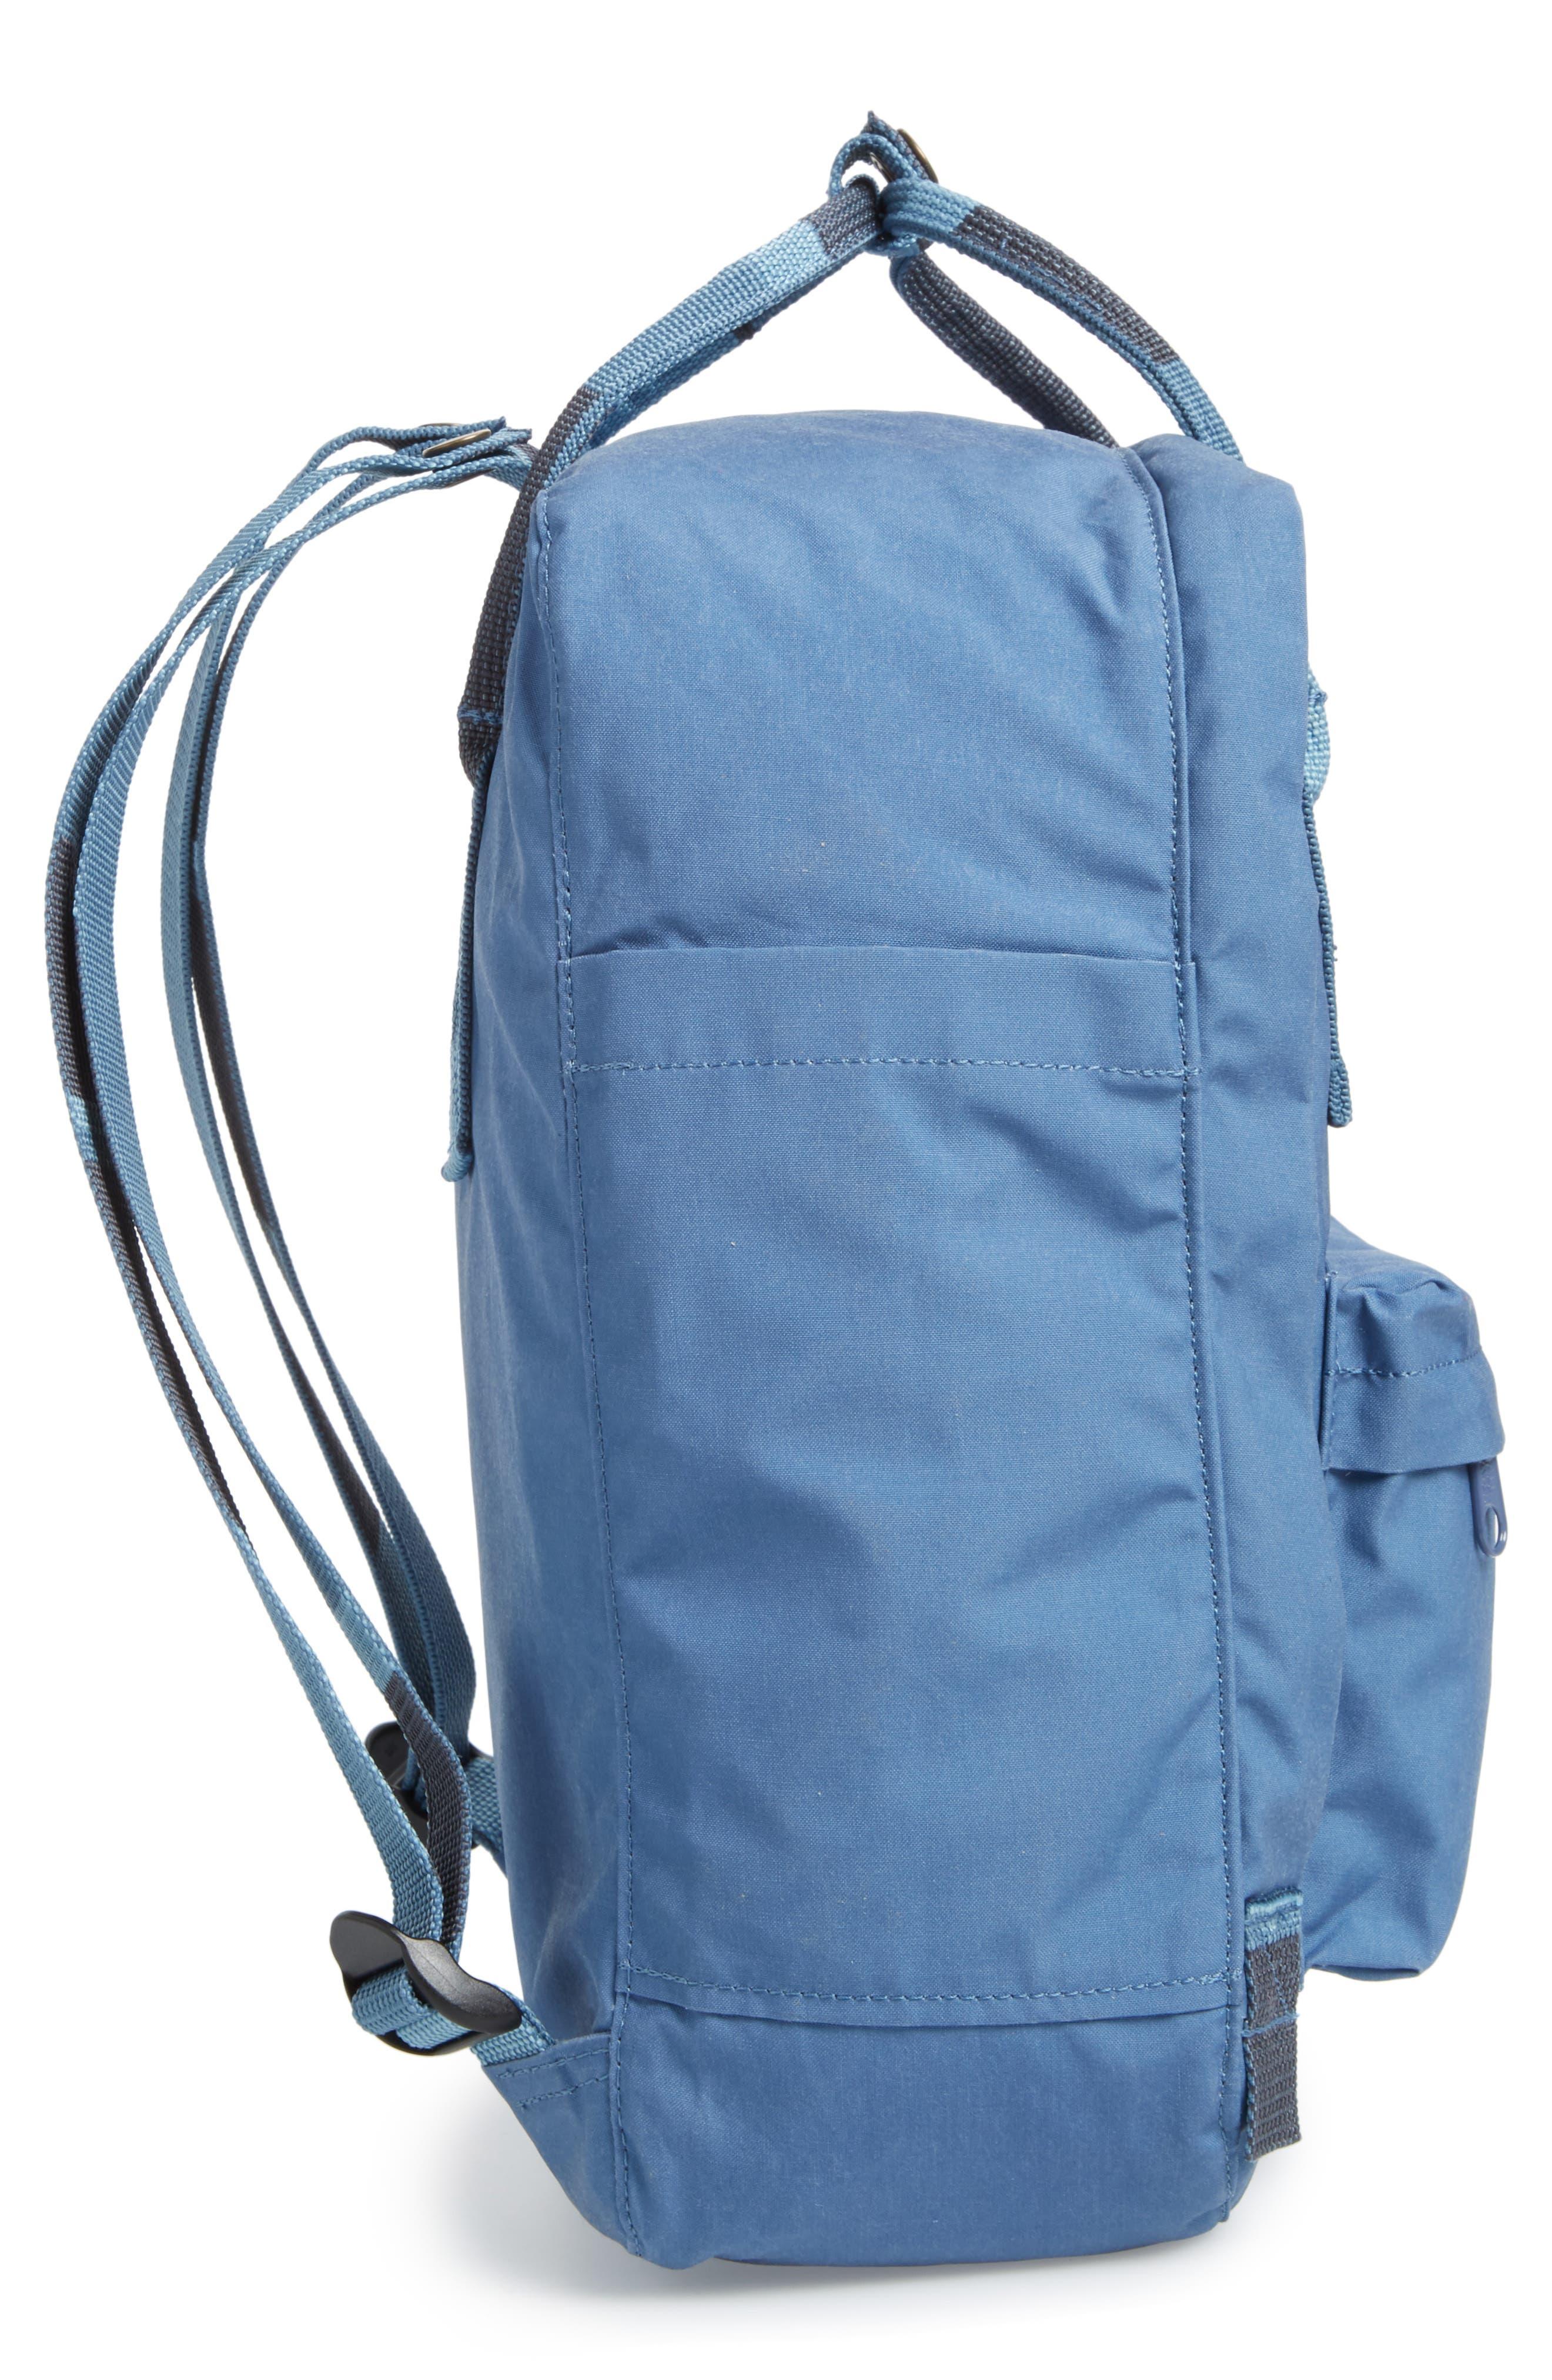 'Kånken' Water Resistant Backpack,                             Alternate thumbnail 5, color,                             Blue Ridge/ Random Blocked